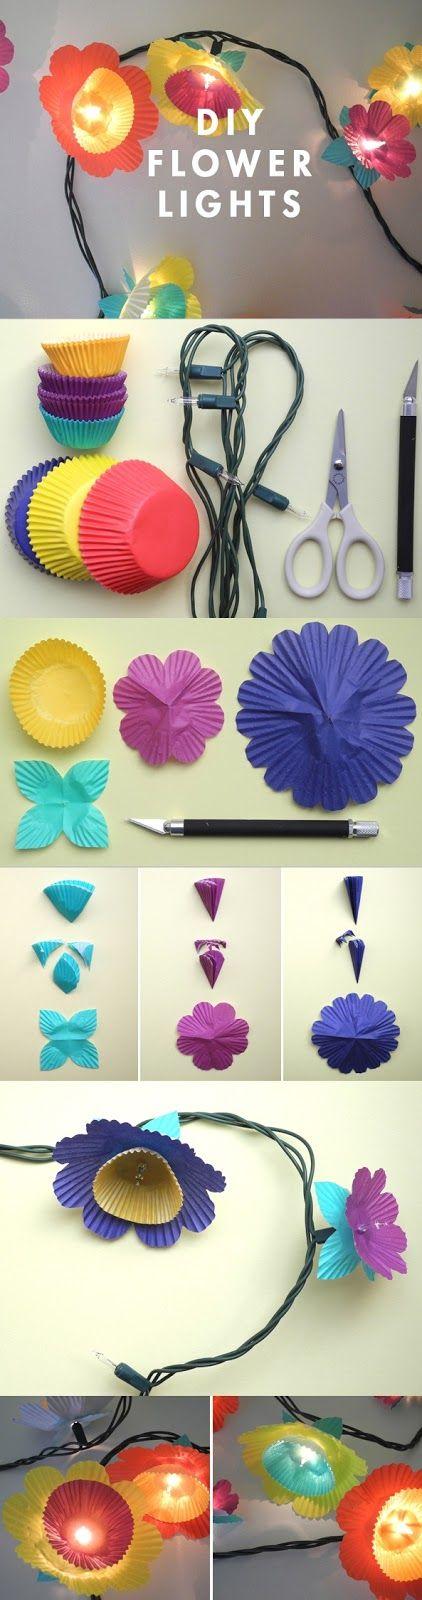 DIY cupcake liner flower lights | Follow for more student stuff >> http://www.pinterest.com/iqstudents/